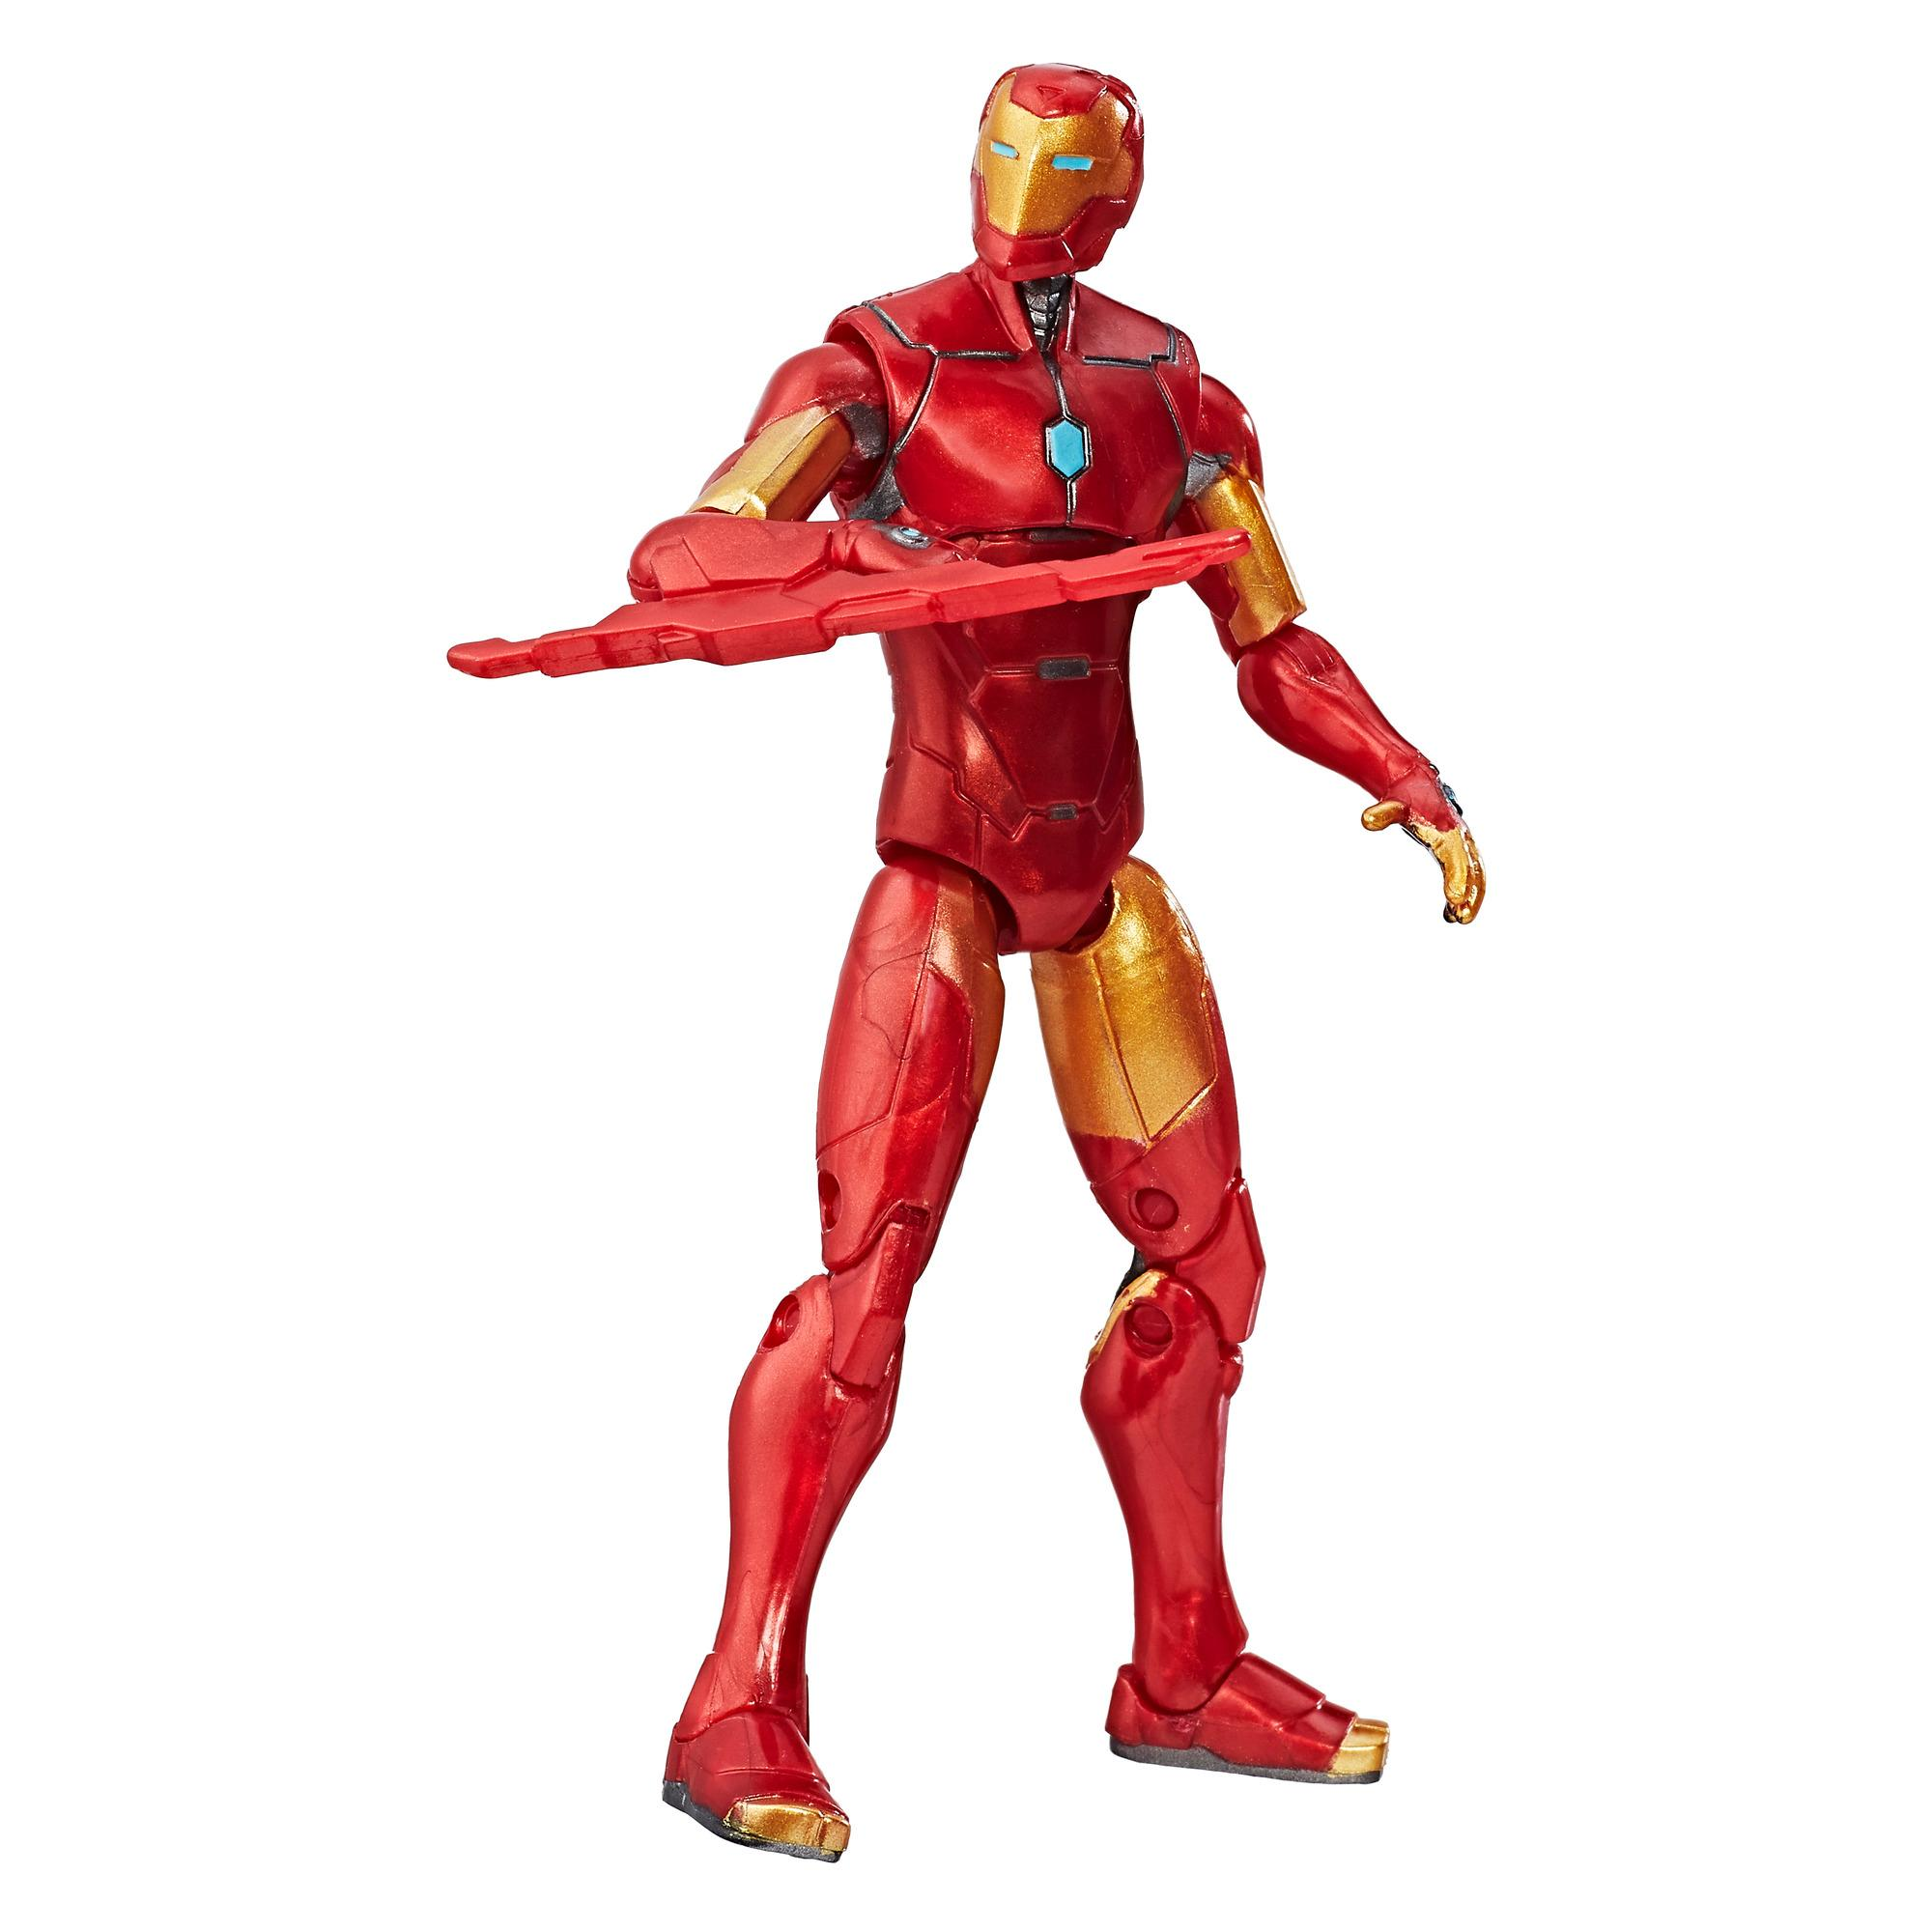 Marvel Legends Series 9,5cm Invincible Iron Man